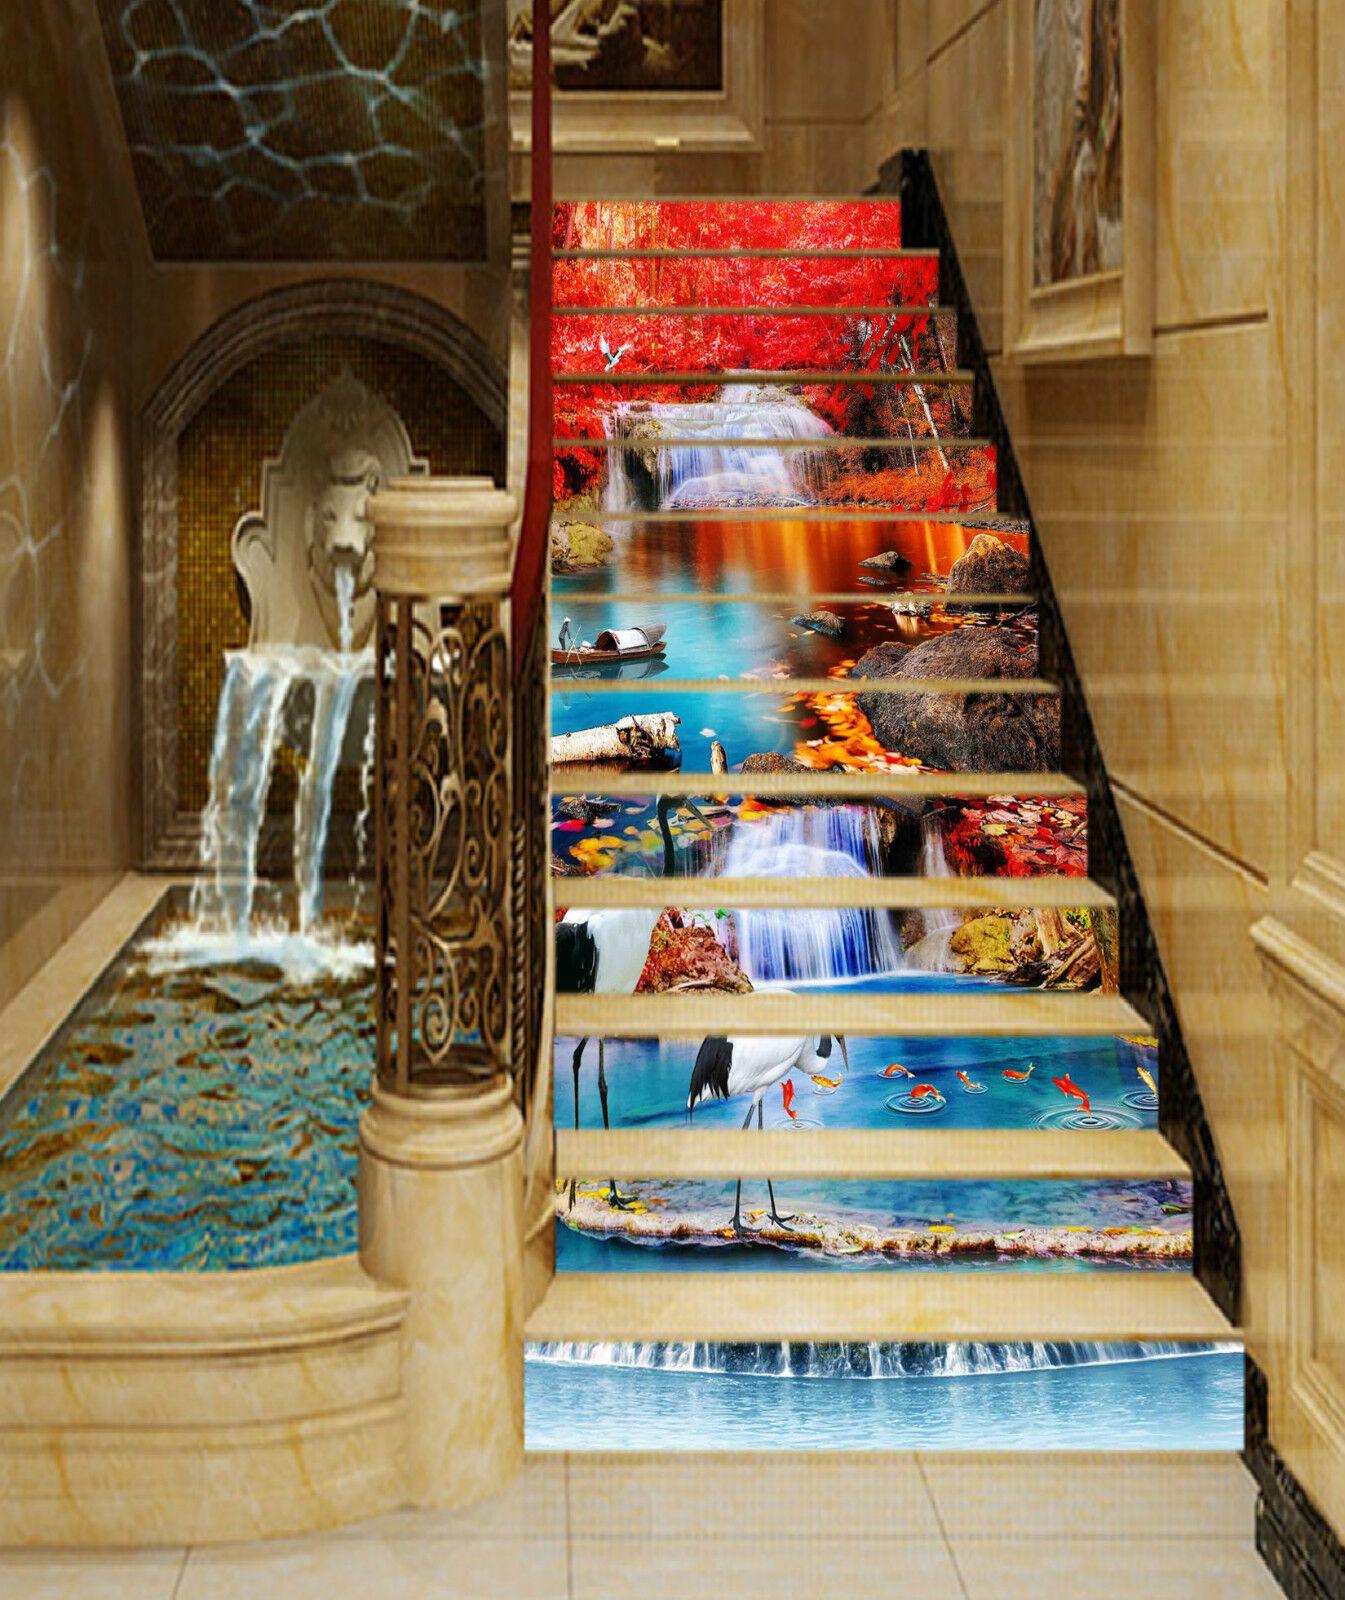 3D Wald Teich 855 Stair Risers Dekoration Fototapete Vinyl Aufkleber Tapete DE